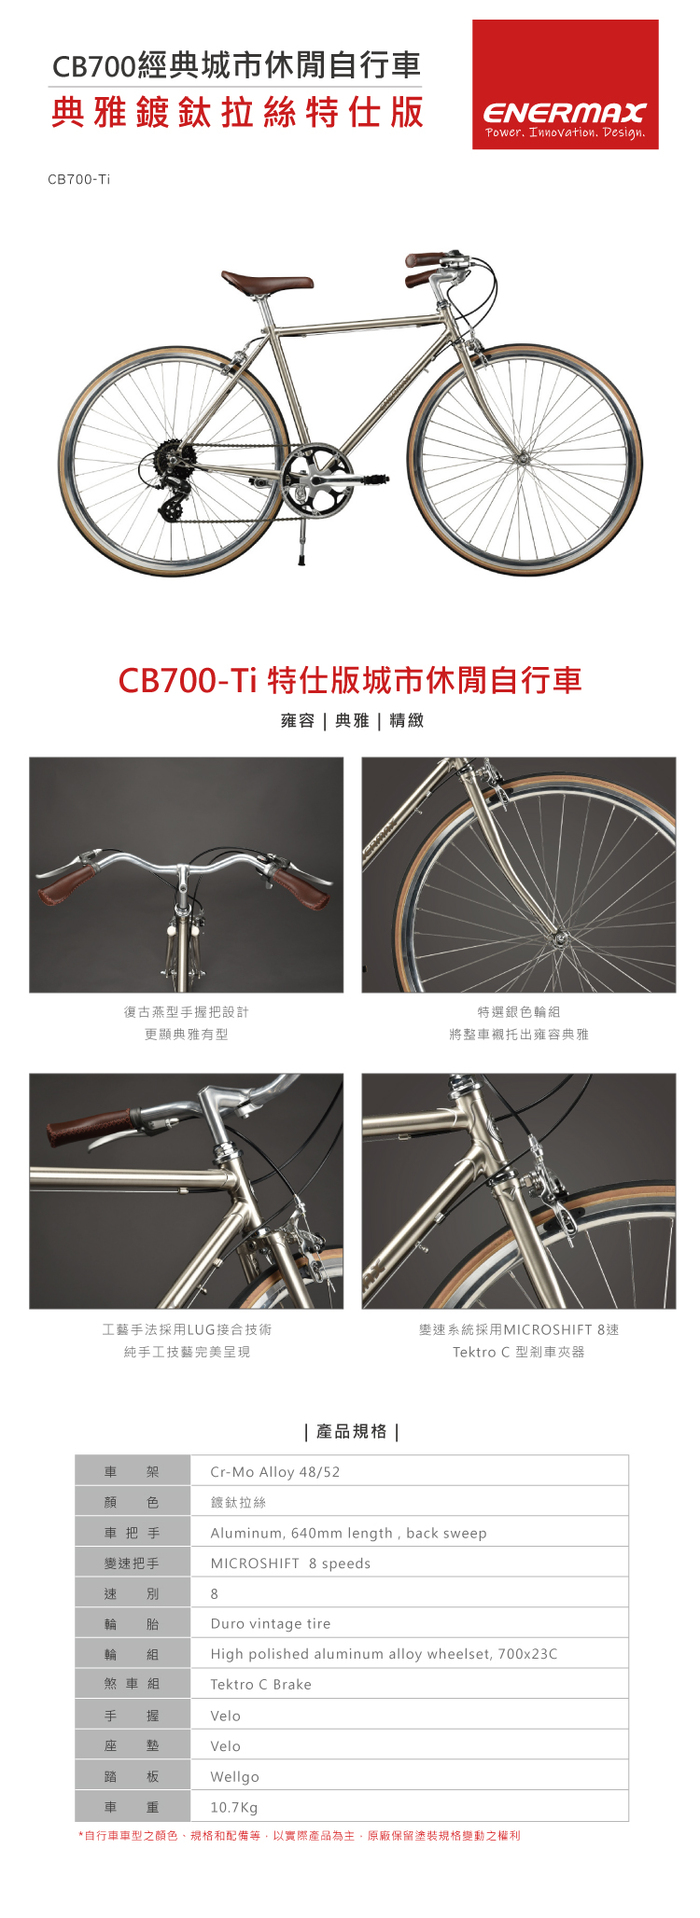 ENERMAX安耐美|CB700-TI古典城市休閒自行車-特仕版